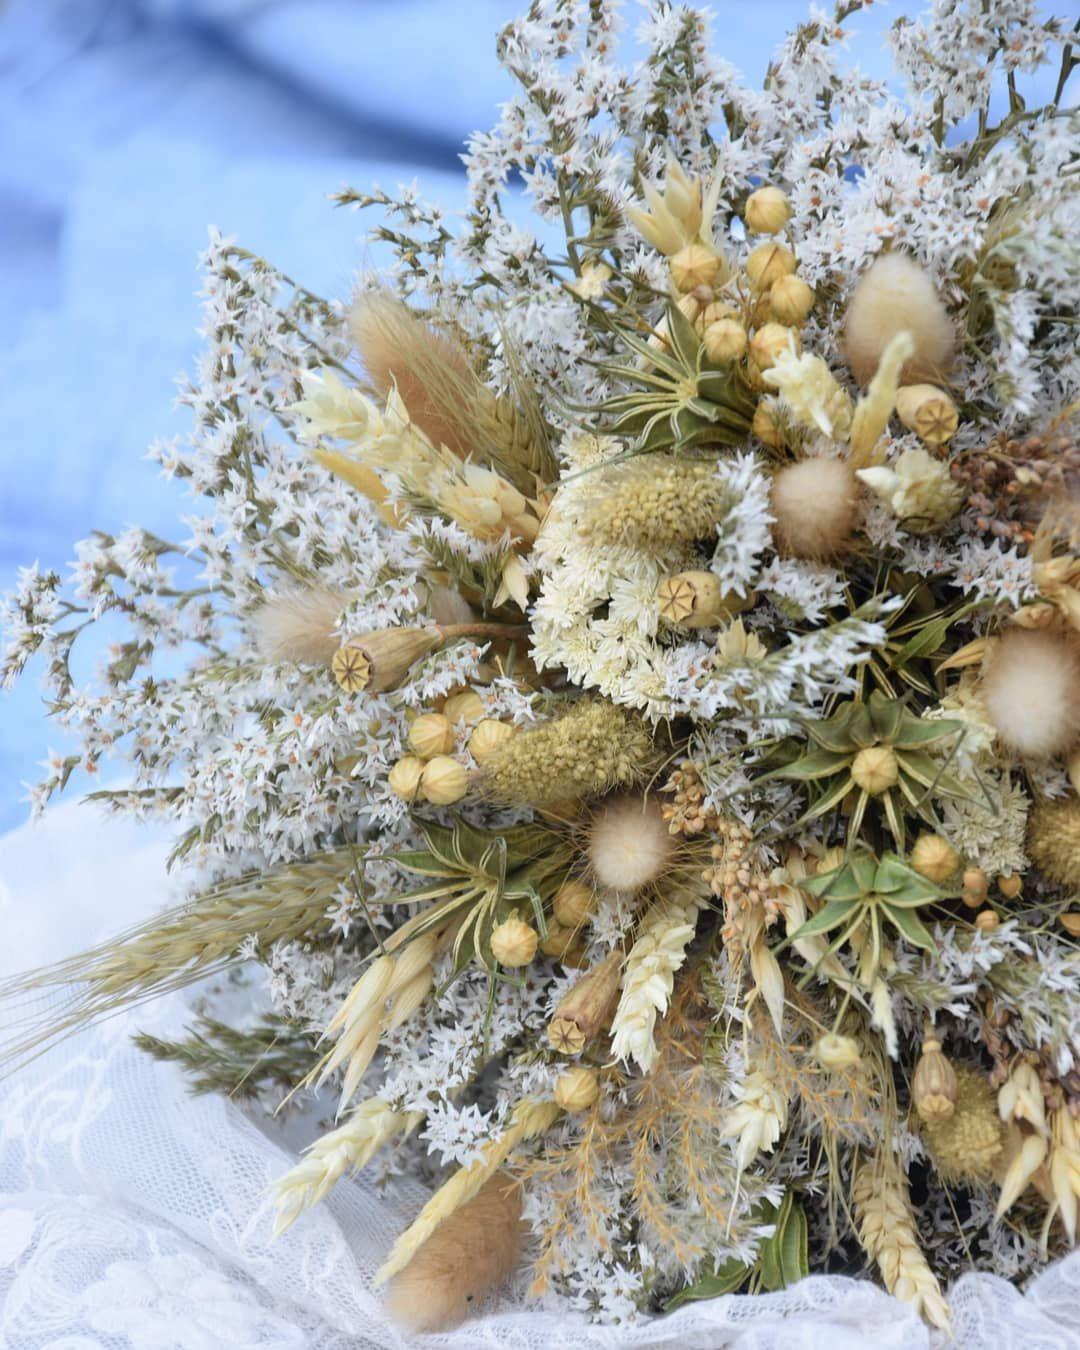 Suche Bukiety Rusticwedding Rusticbride Driedflowers Bukietslubny Iloveflower Inspirebynature Su Rustic Wedding Bouquet Rustic Bouquet Dried Flowers